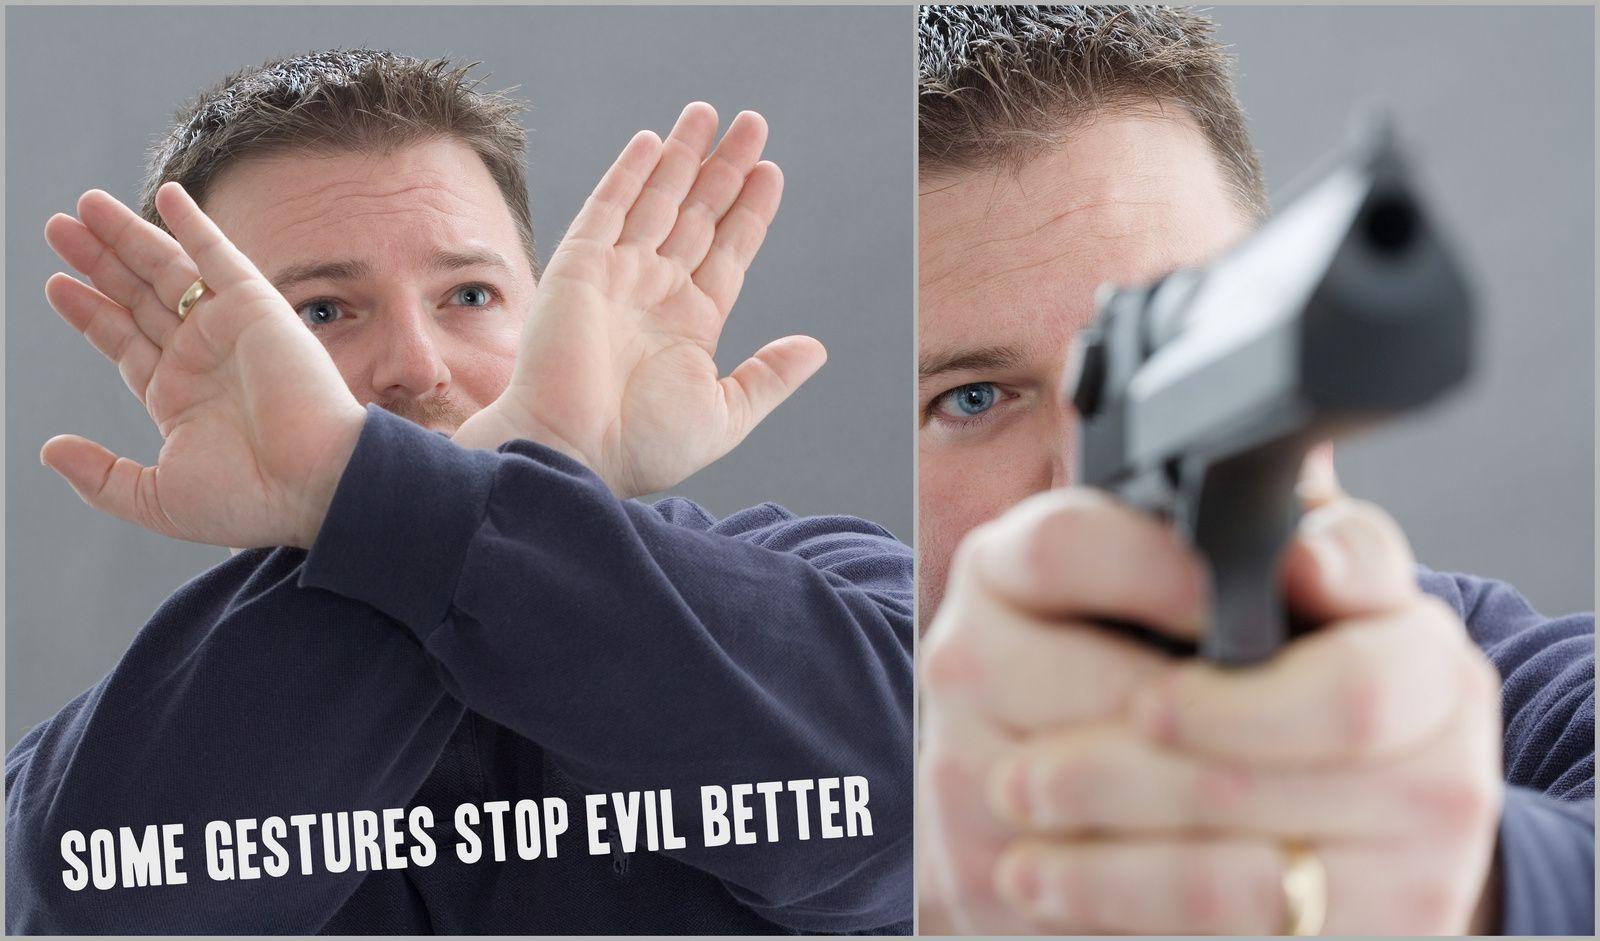 Some gestures stop evil better